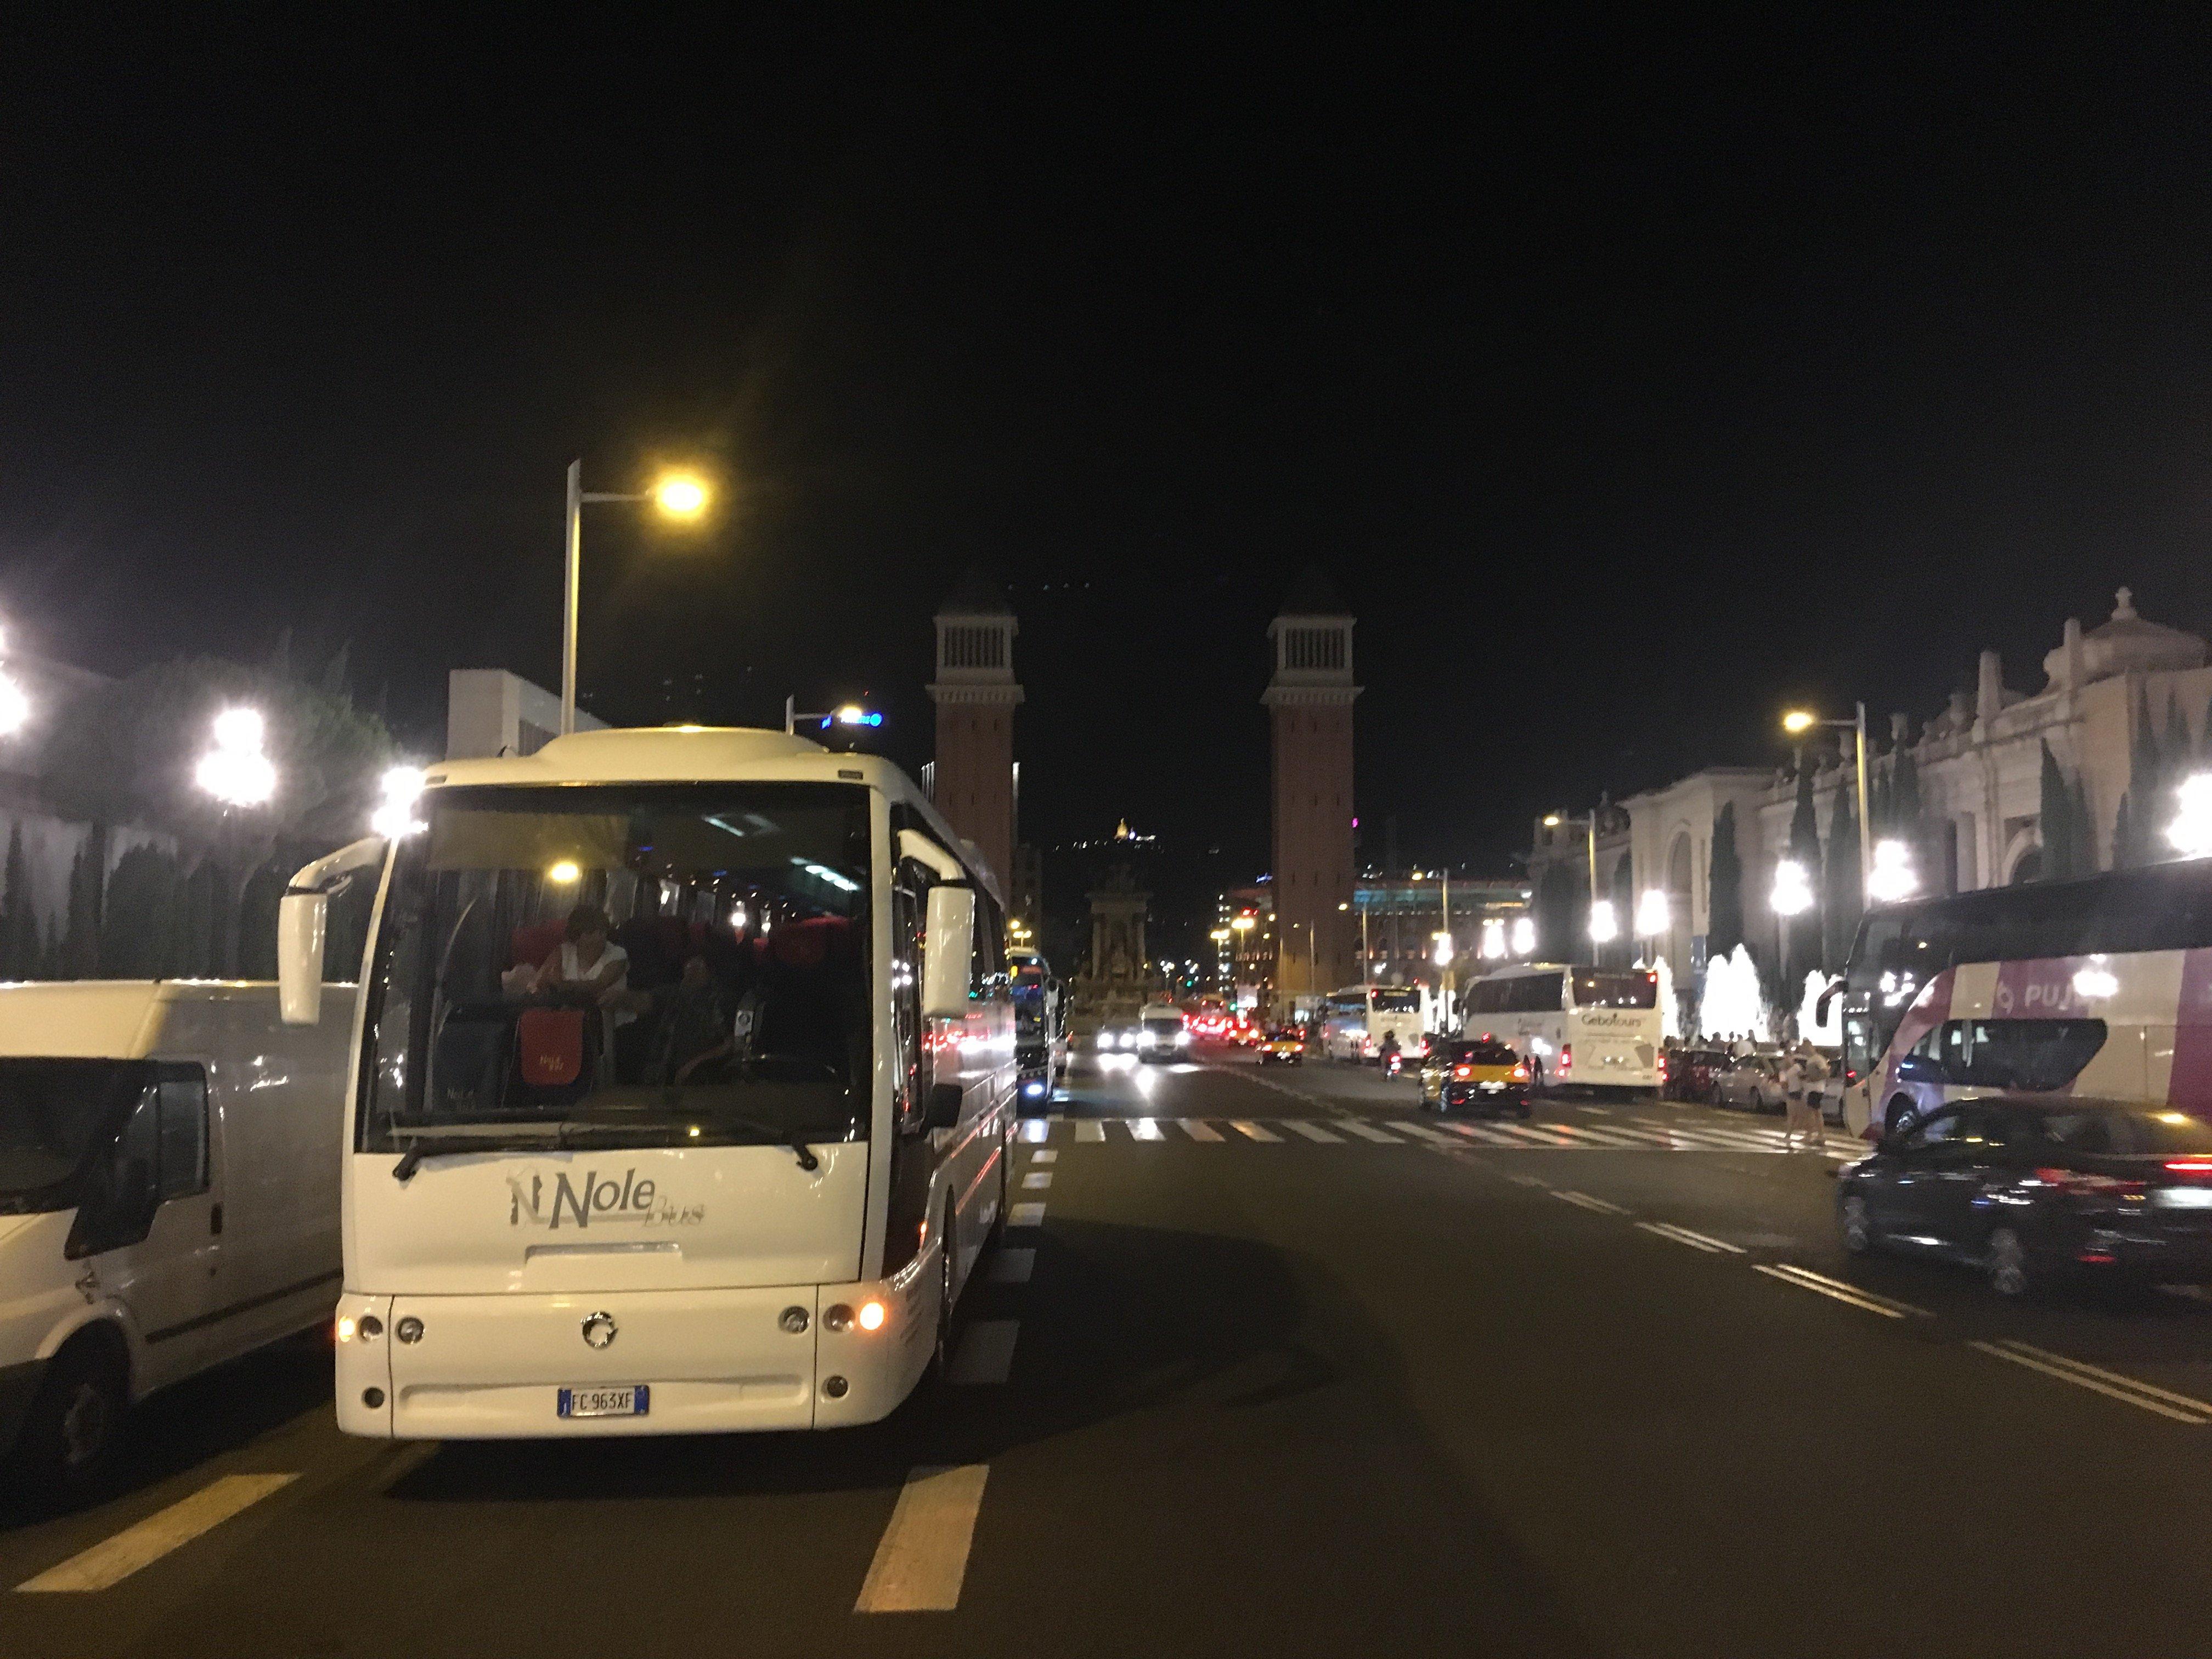 autobus in viaggio di notte Nolobus